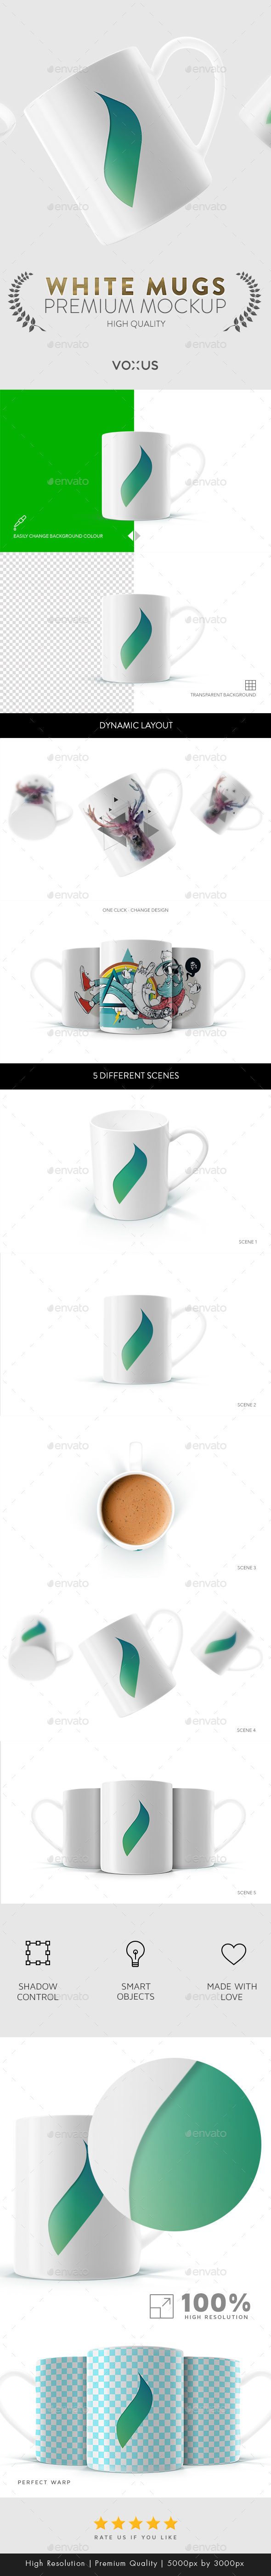 Mug Mock Up - White Mug - Product Mock-Ups Graphics